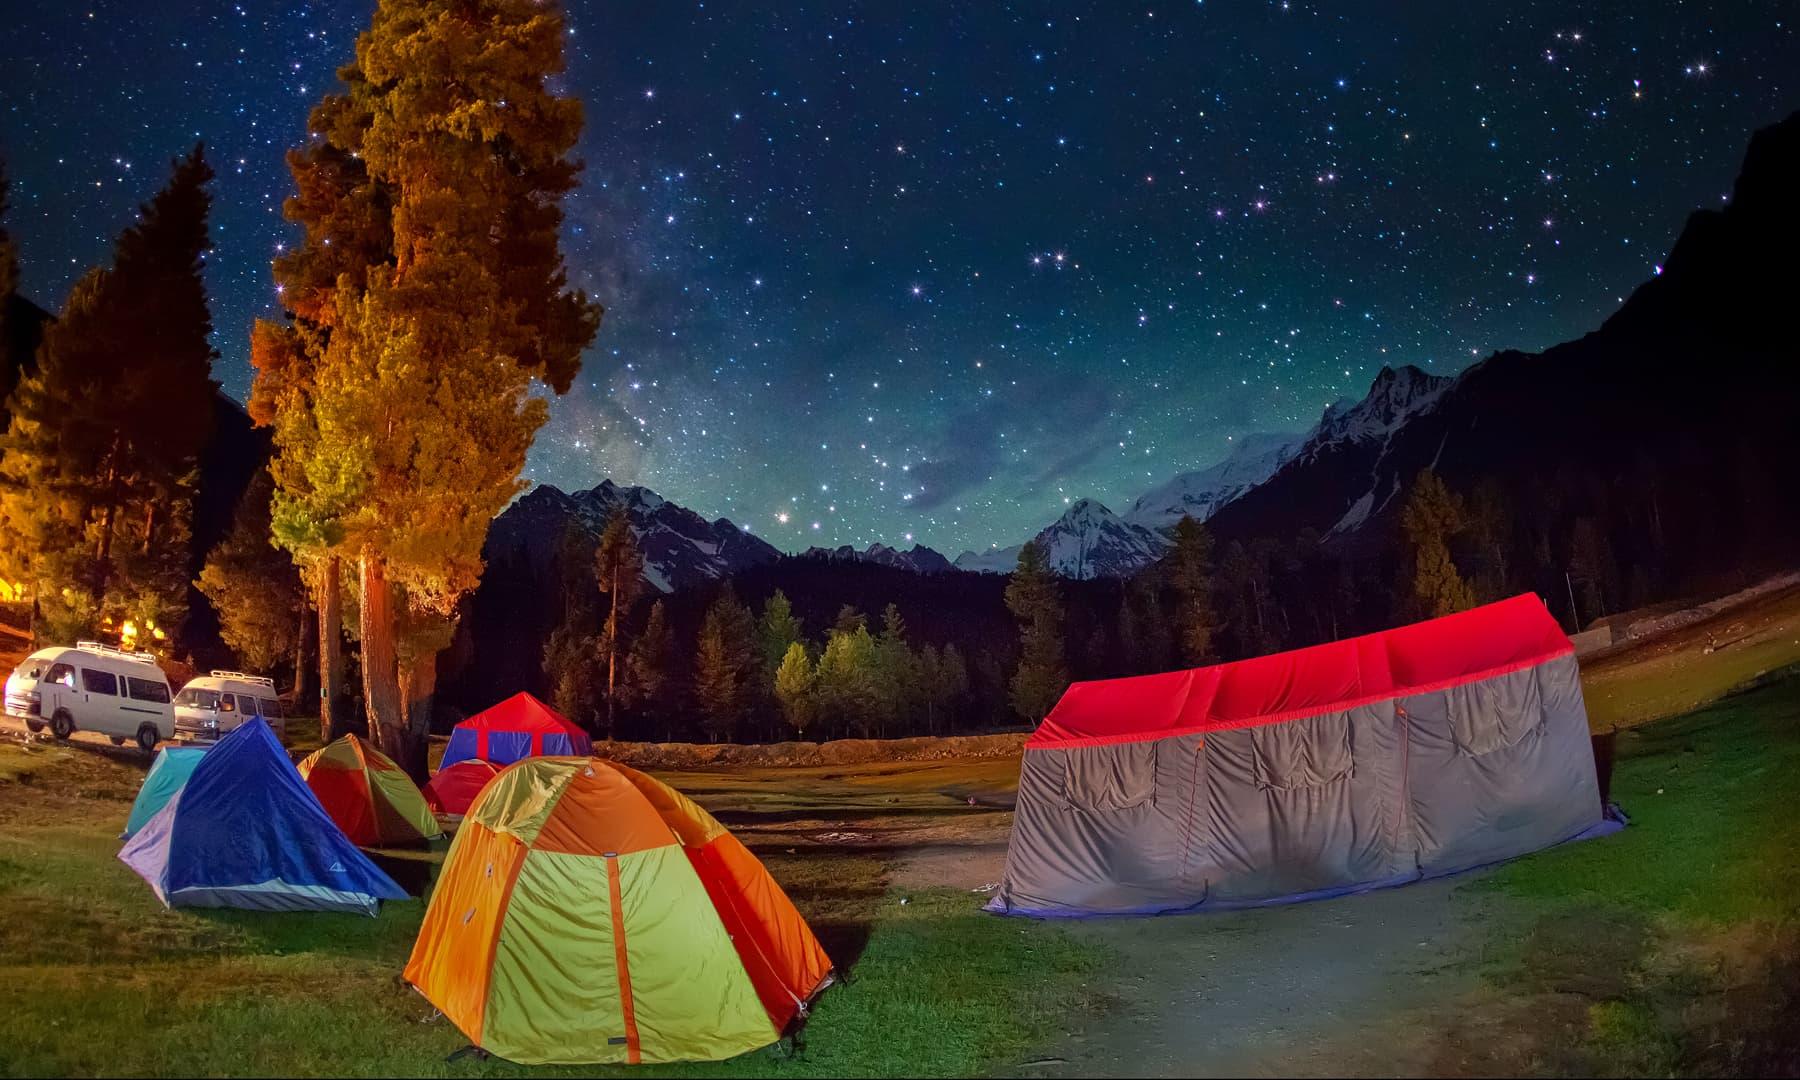 Campsite in Rama. — Syed Mehdi Bukhari